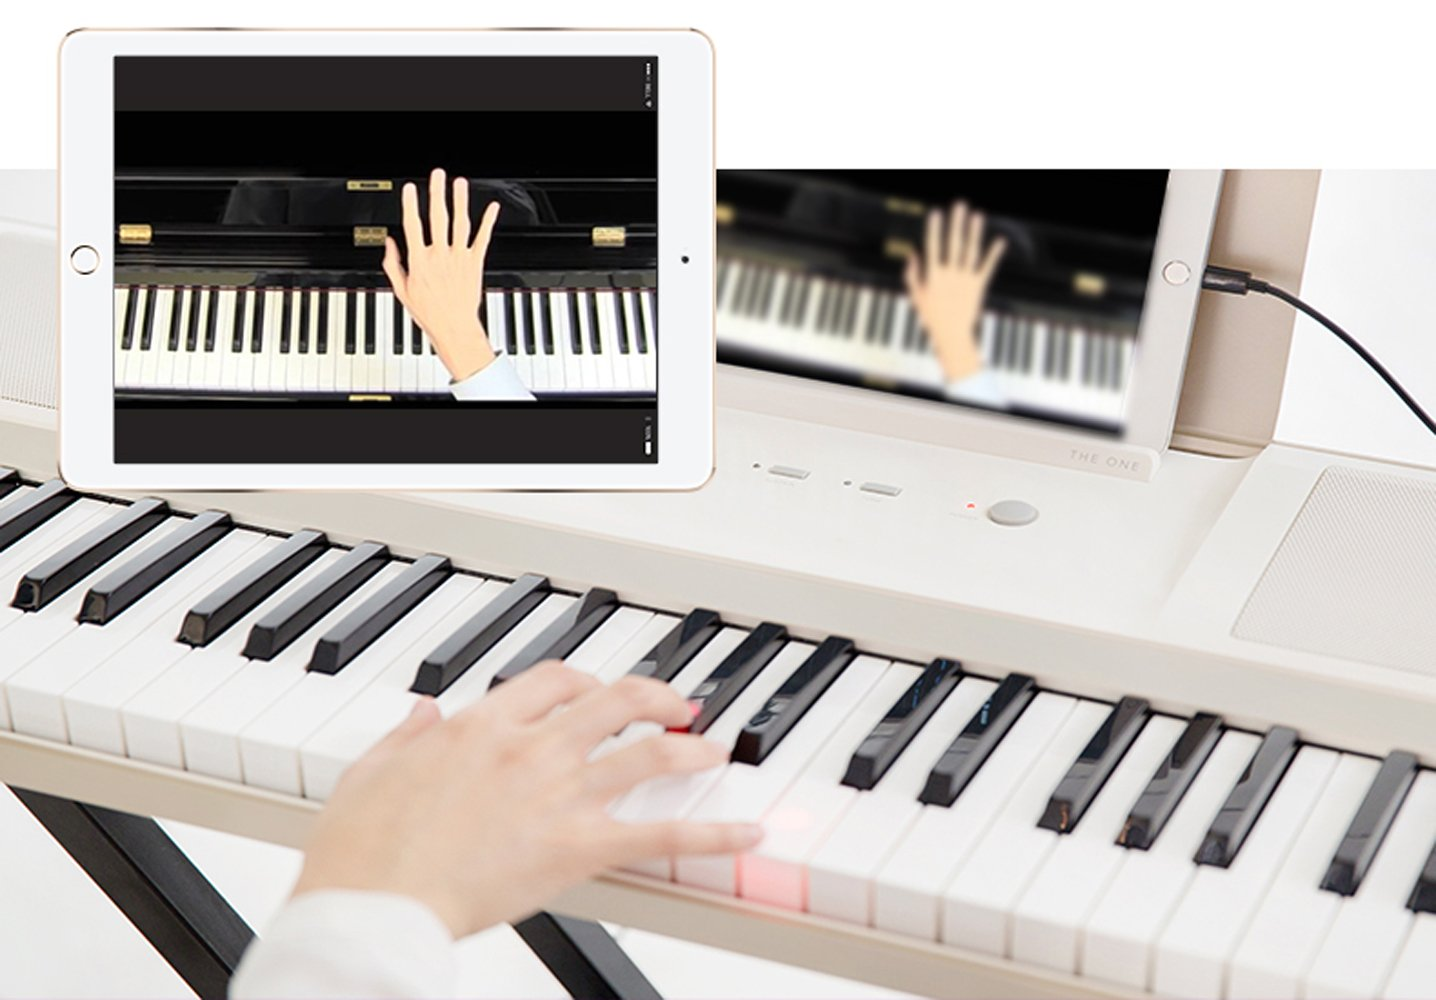 The ONE Smart Piano 61-Key Portable Light Keyboard, USB MIDI Electronic Keyboard Piano - Onyx Black by The ONE Smart Piano (Image #4)